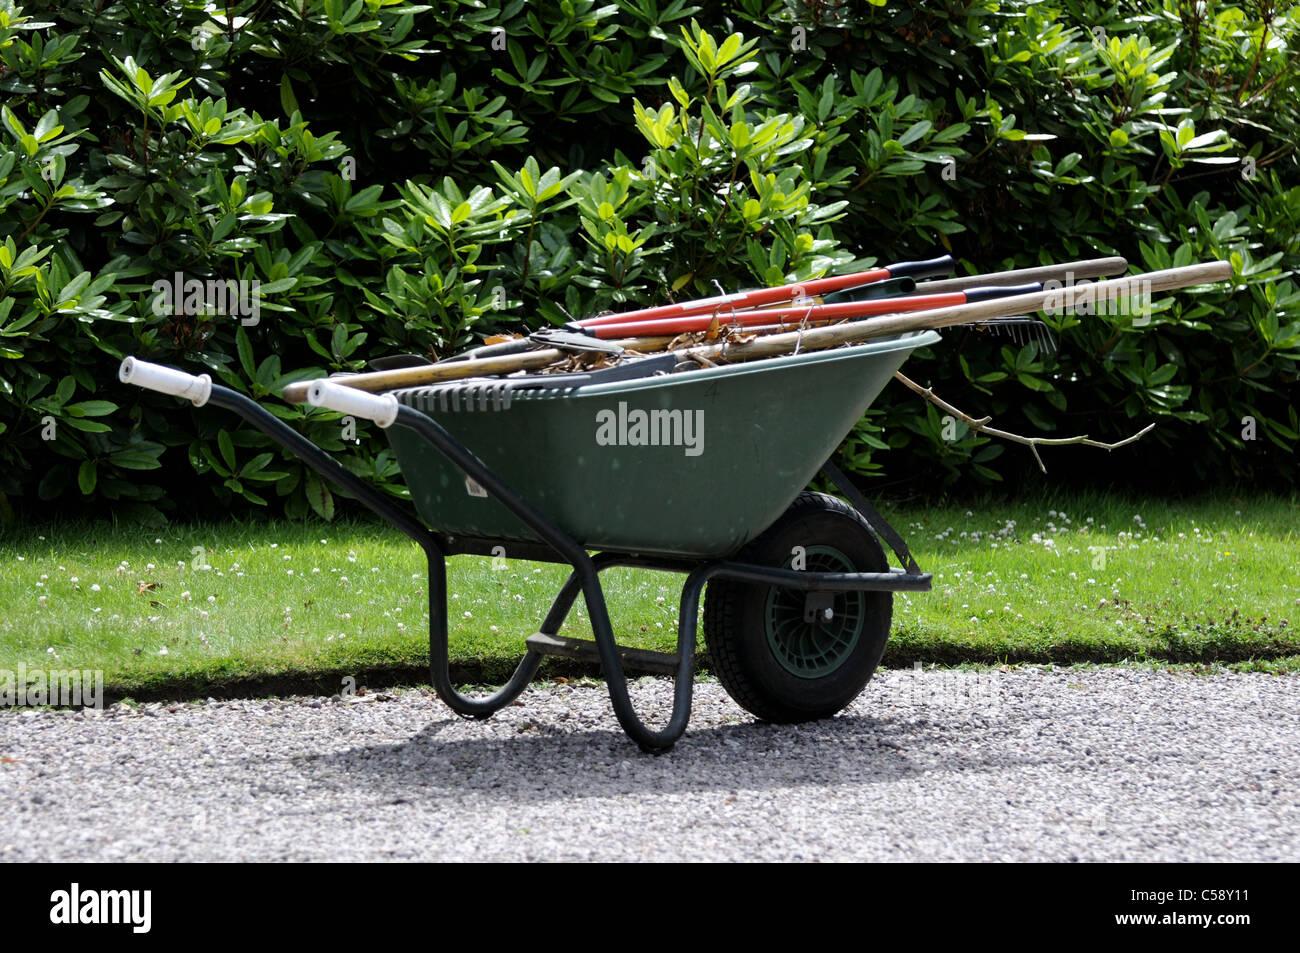 White handled green wheelbarrow full of gardening tools - Stock Image